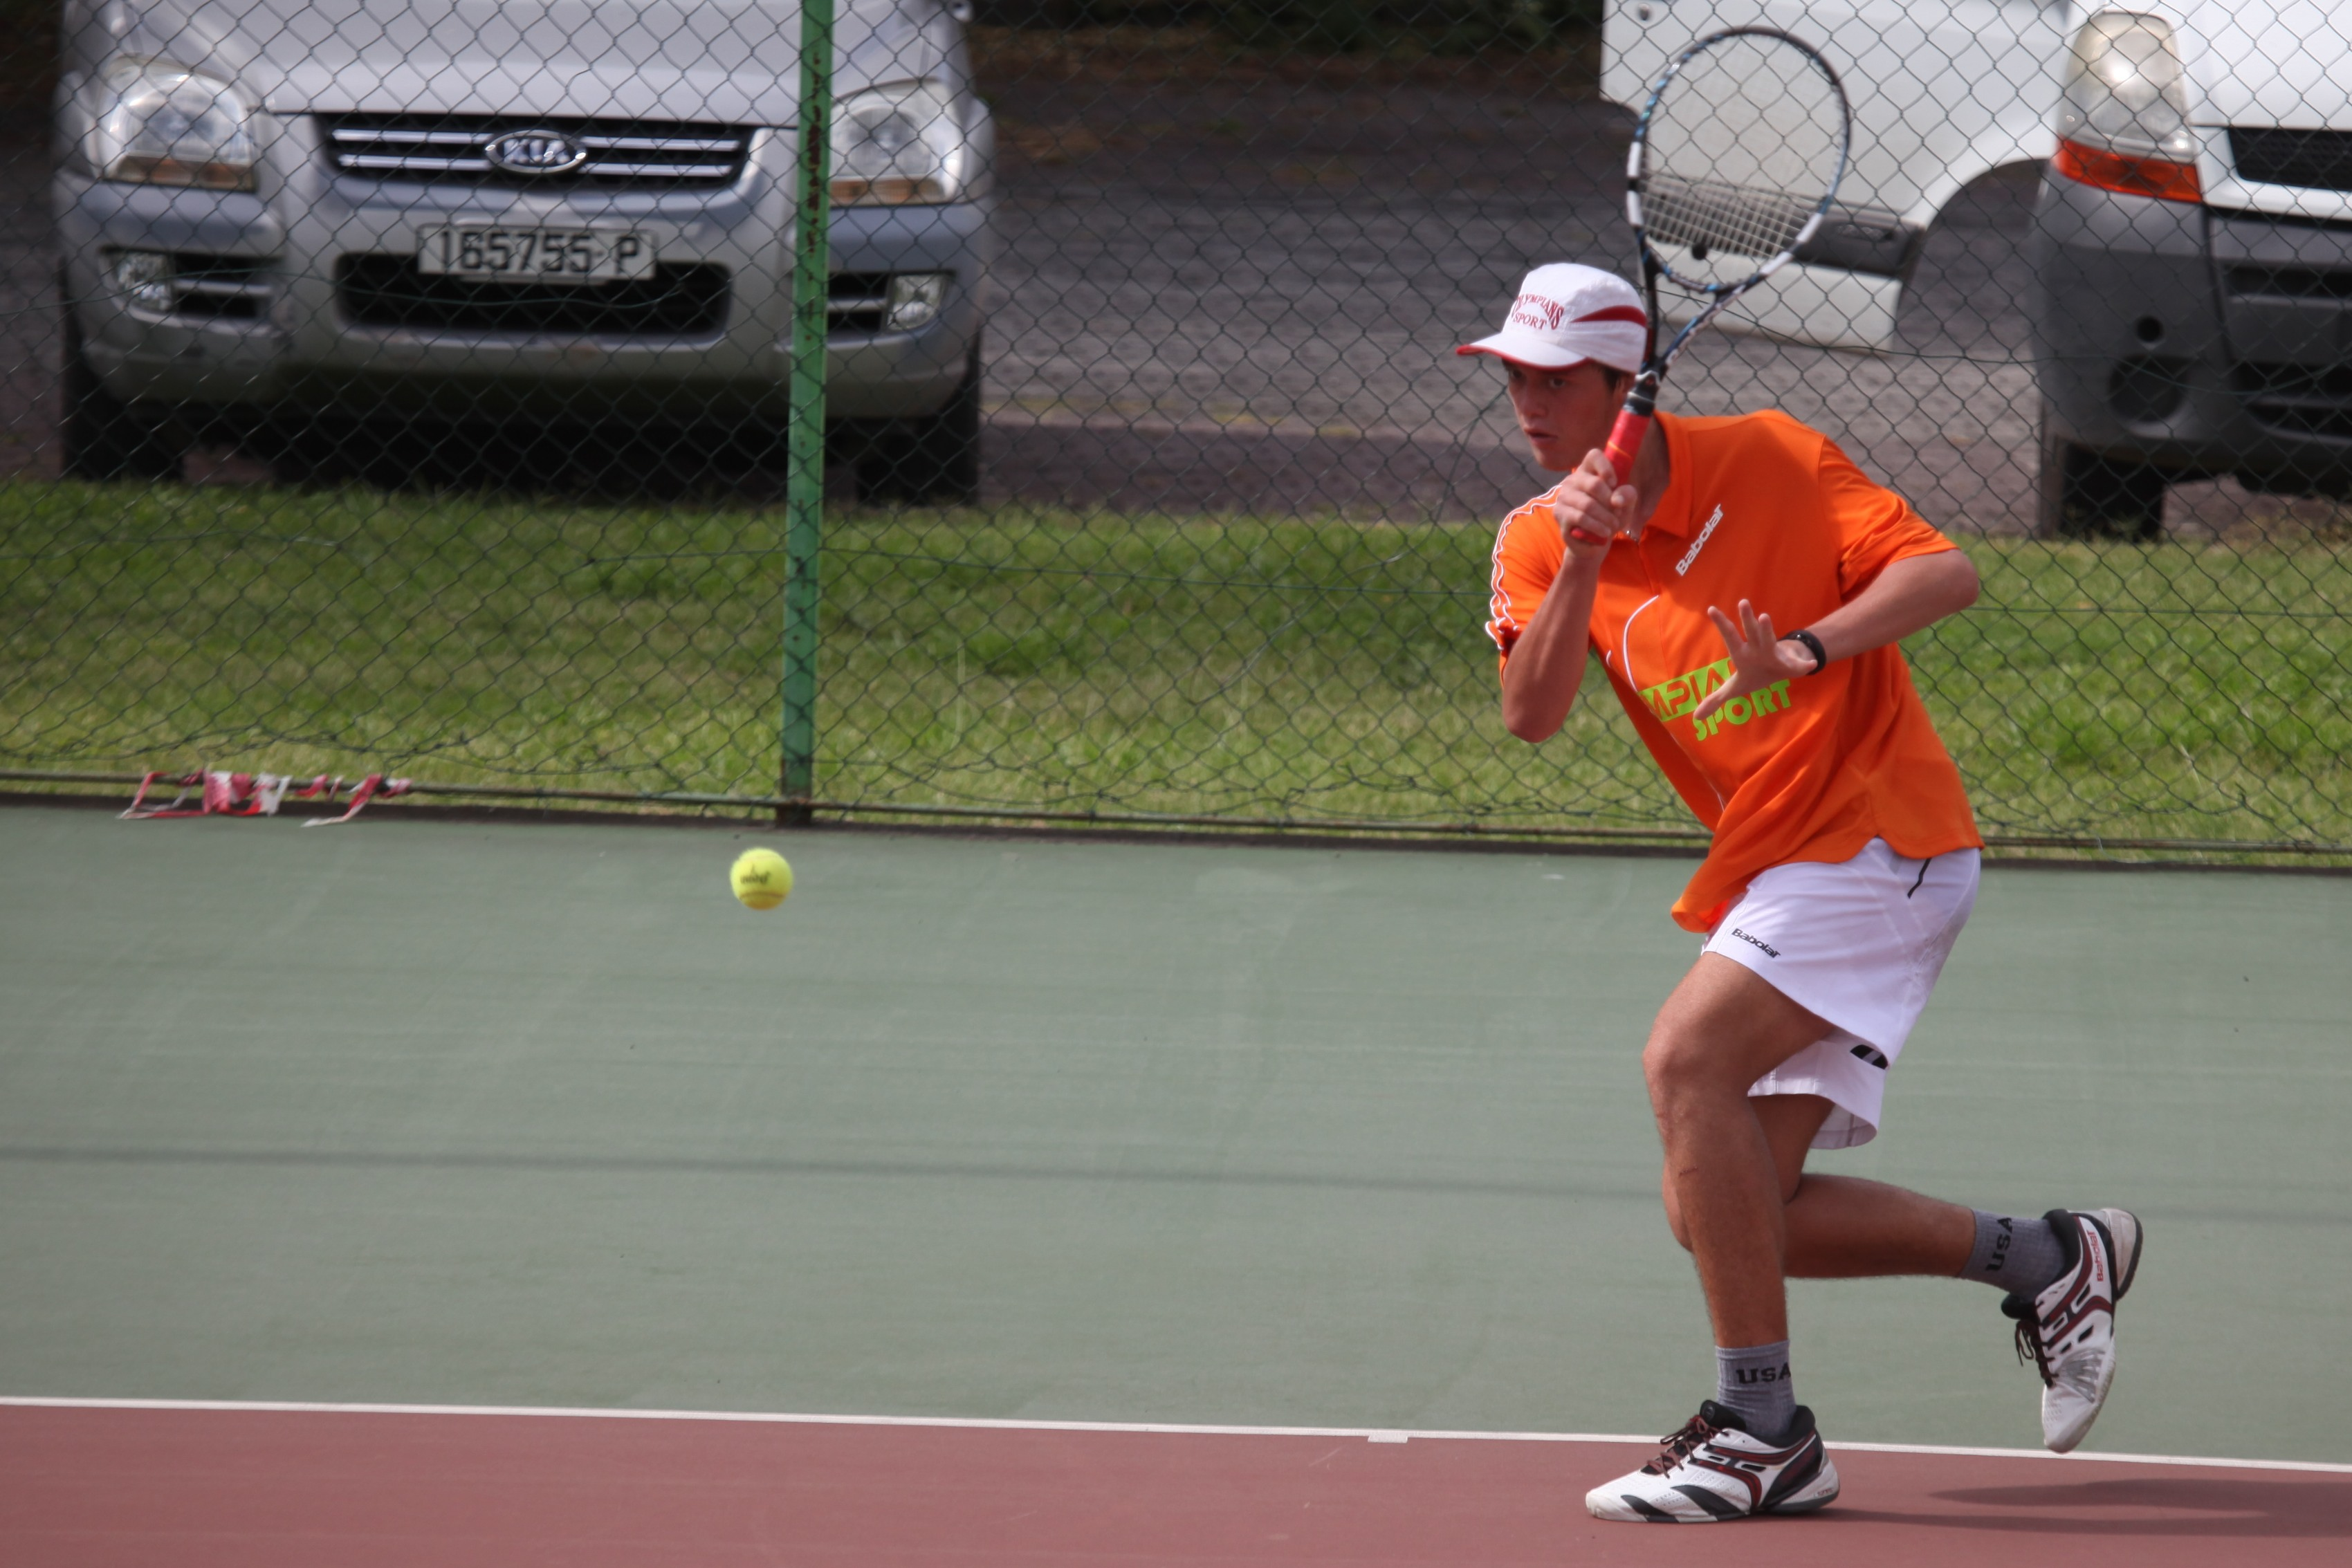 Tennis Top 12 - Heve Kelley, 16 ans, bat le champion de Polynésie !